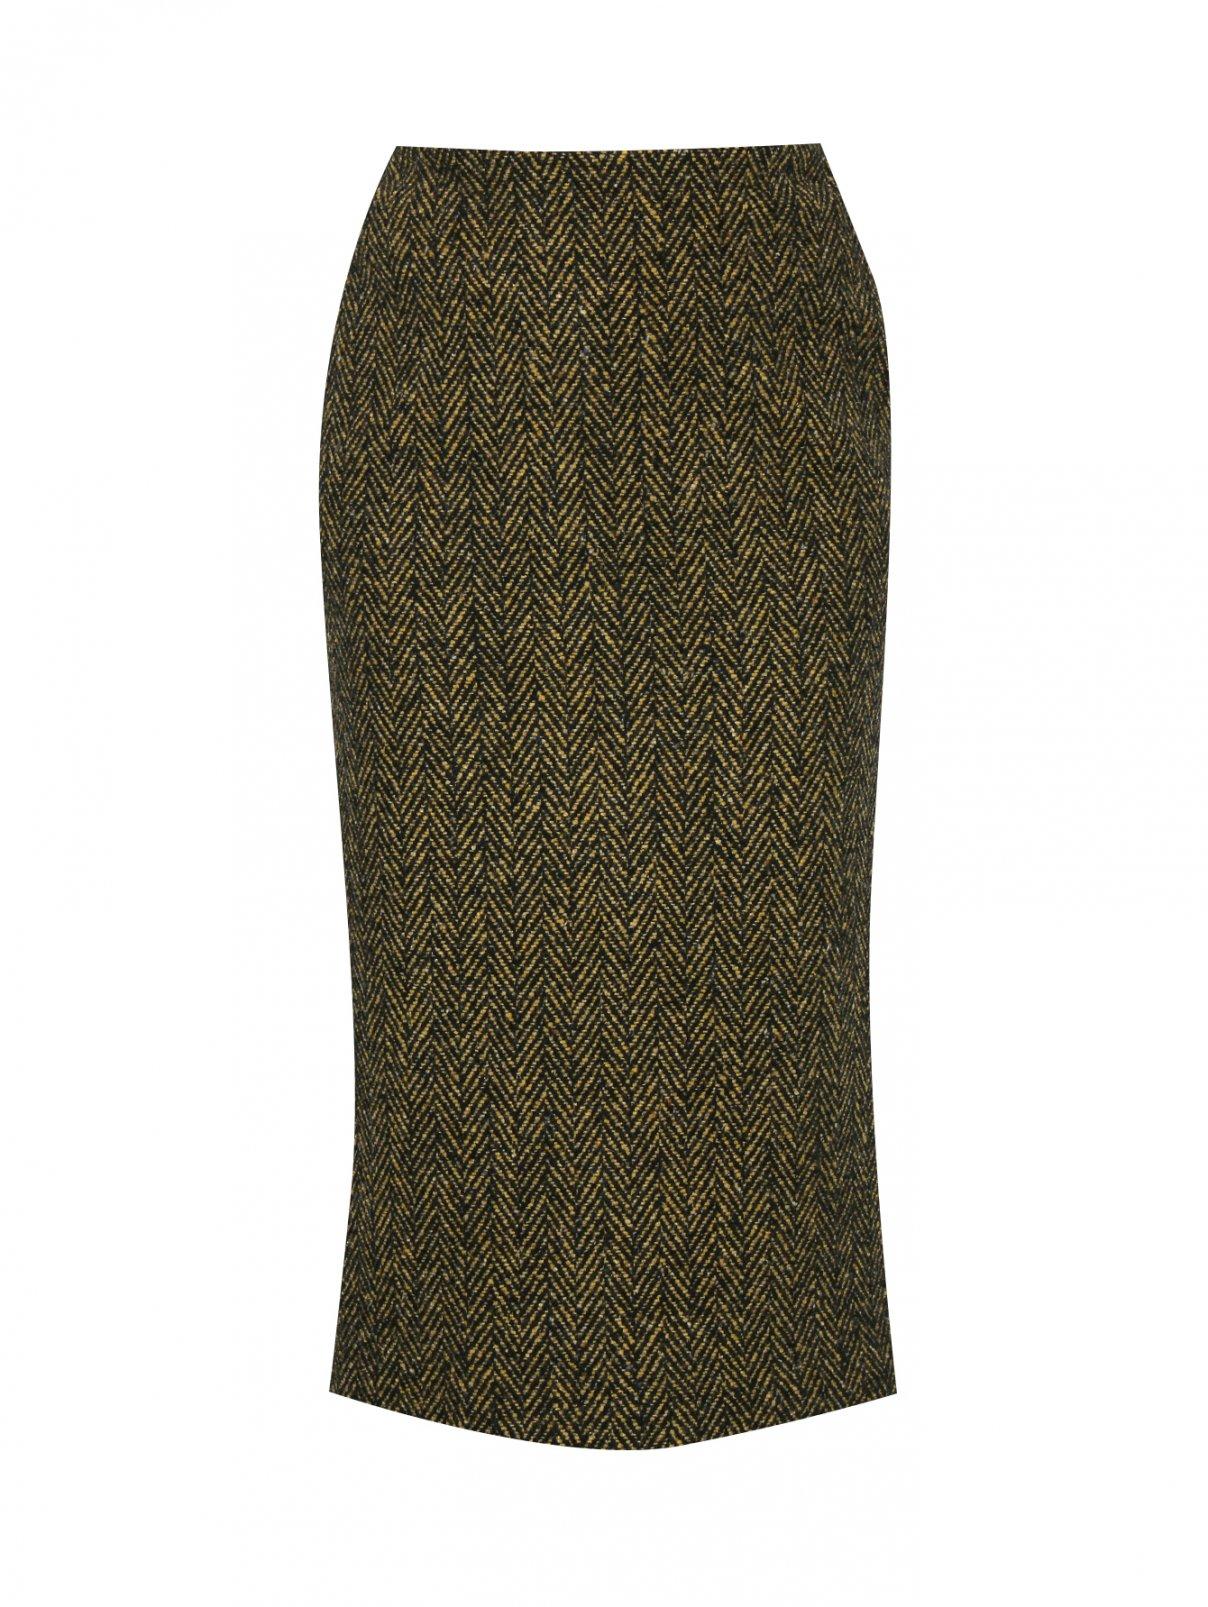 Юбка из шерсти и кашемира с узором Ermanno Scervino  –  Общий вид